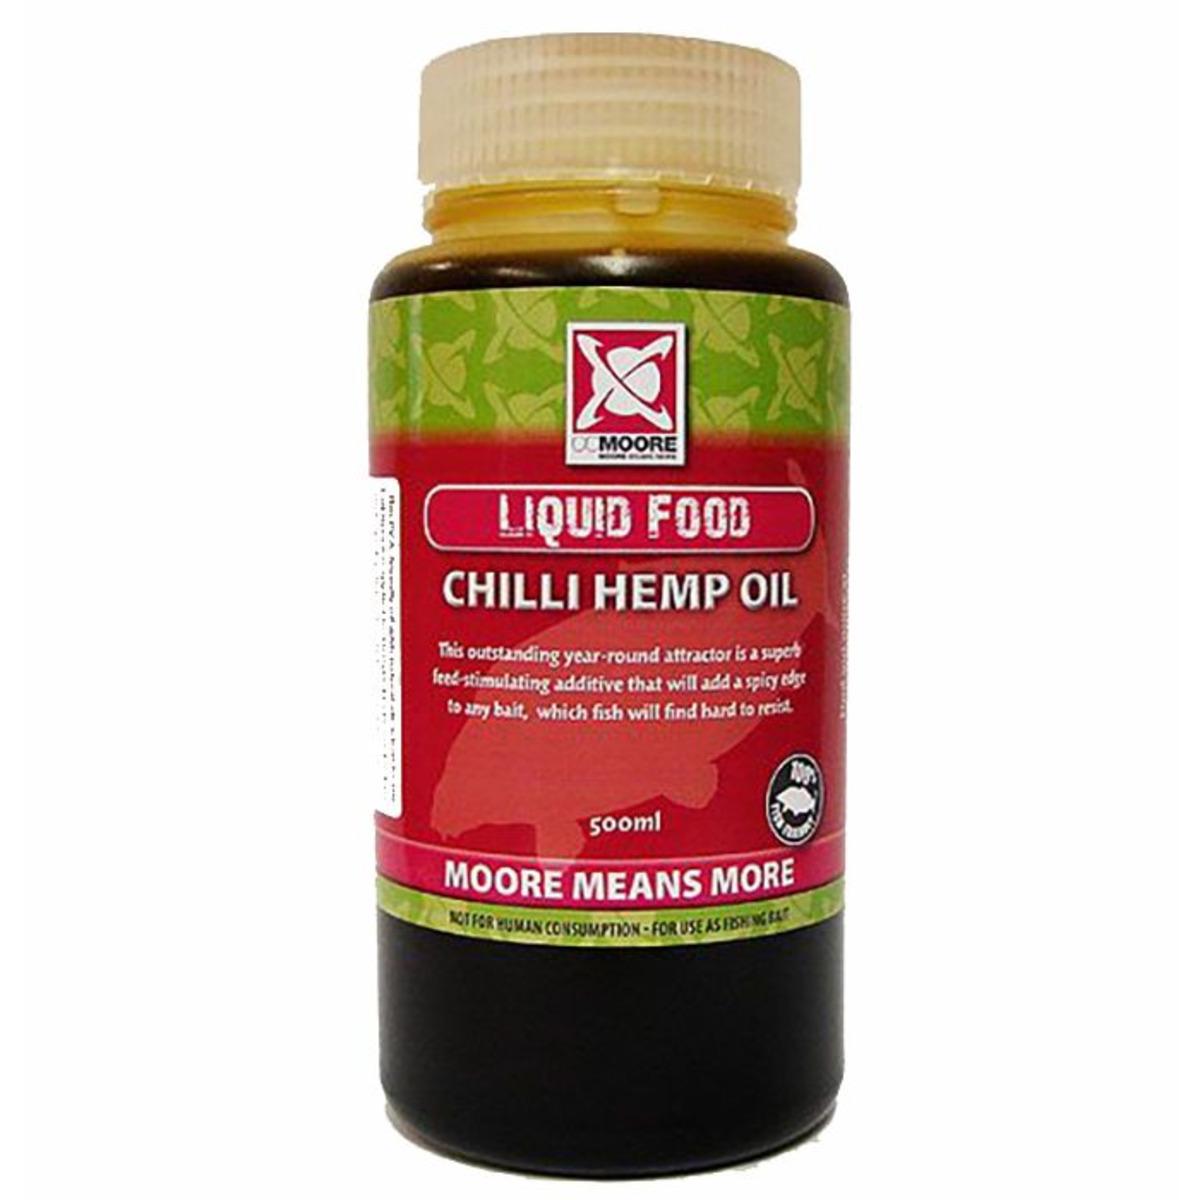 CC Moore Chilli Hemp Oil - 500 ml